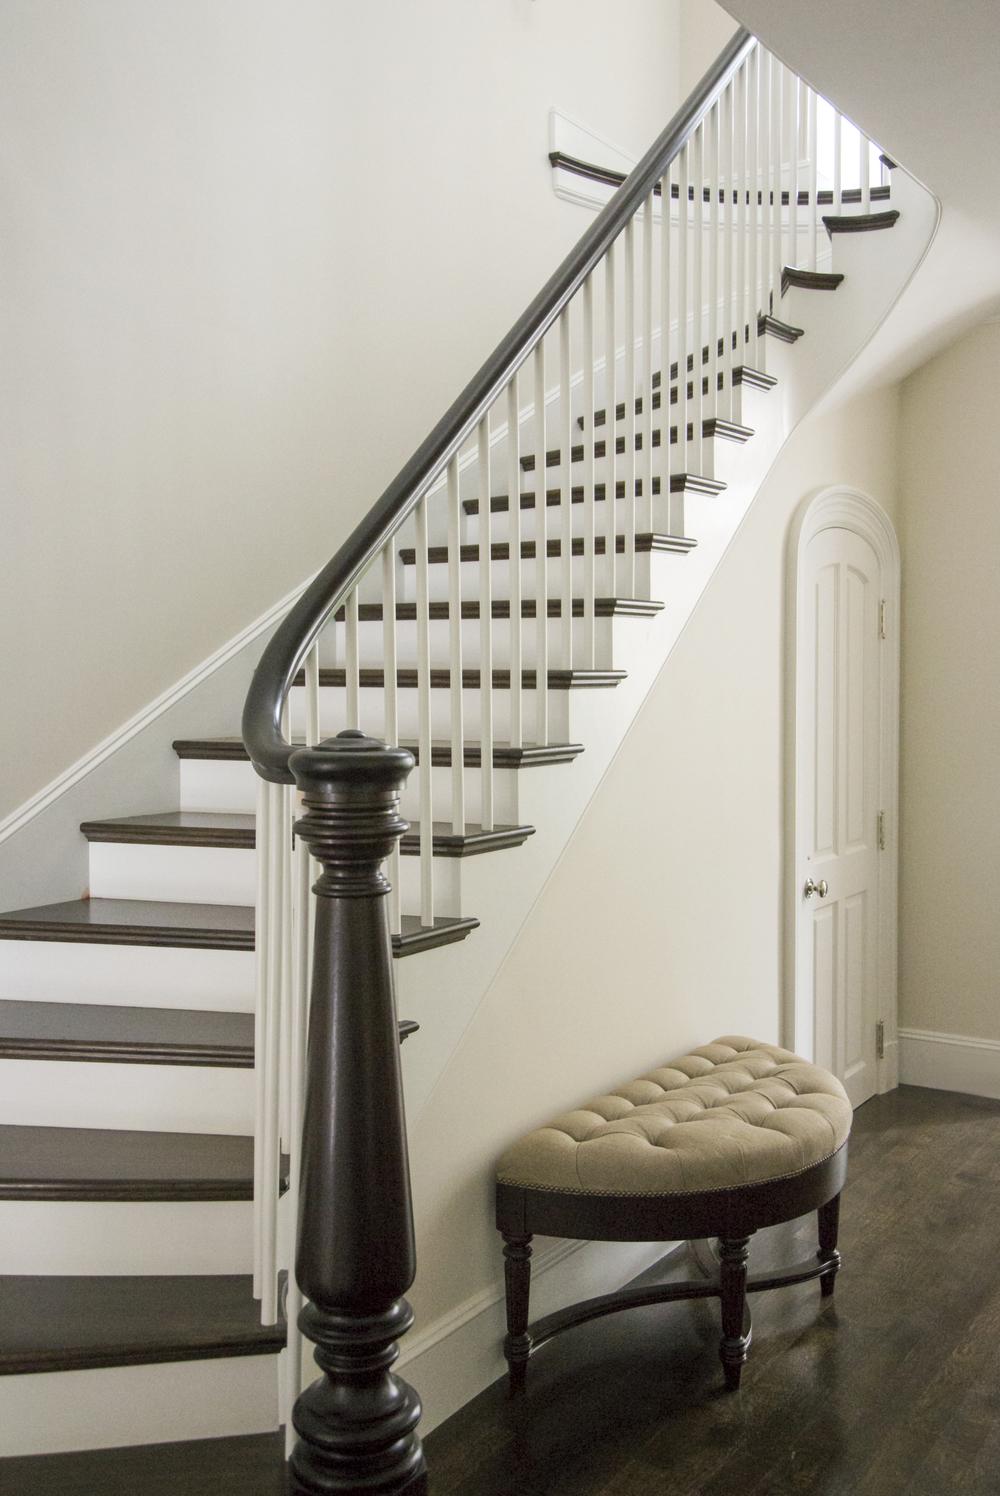 Angus Bealsey 5 14 Cedar St stairs 8.jpg